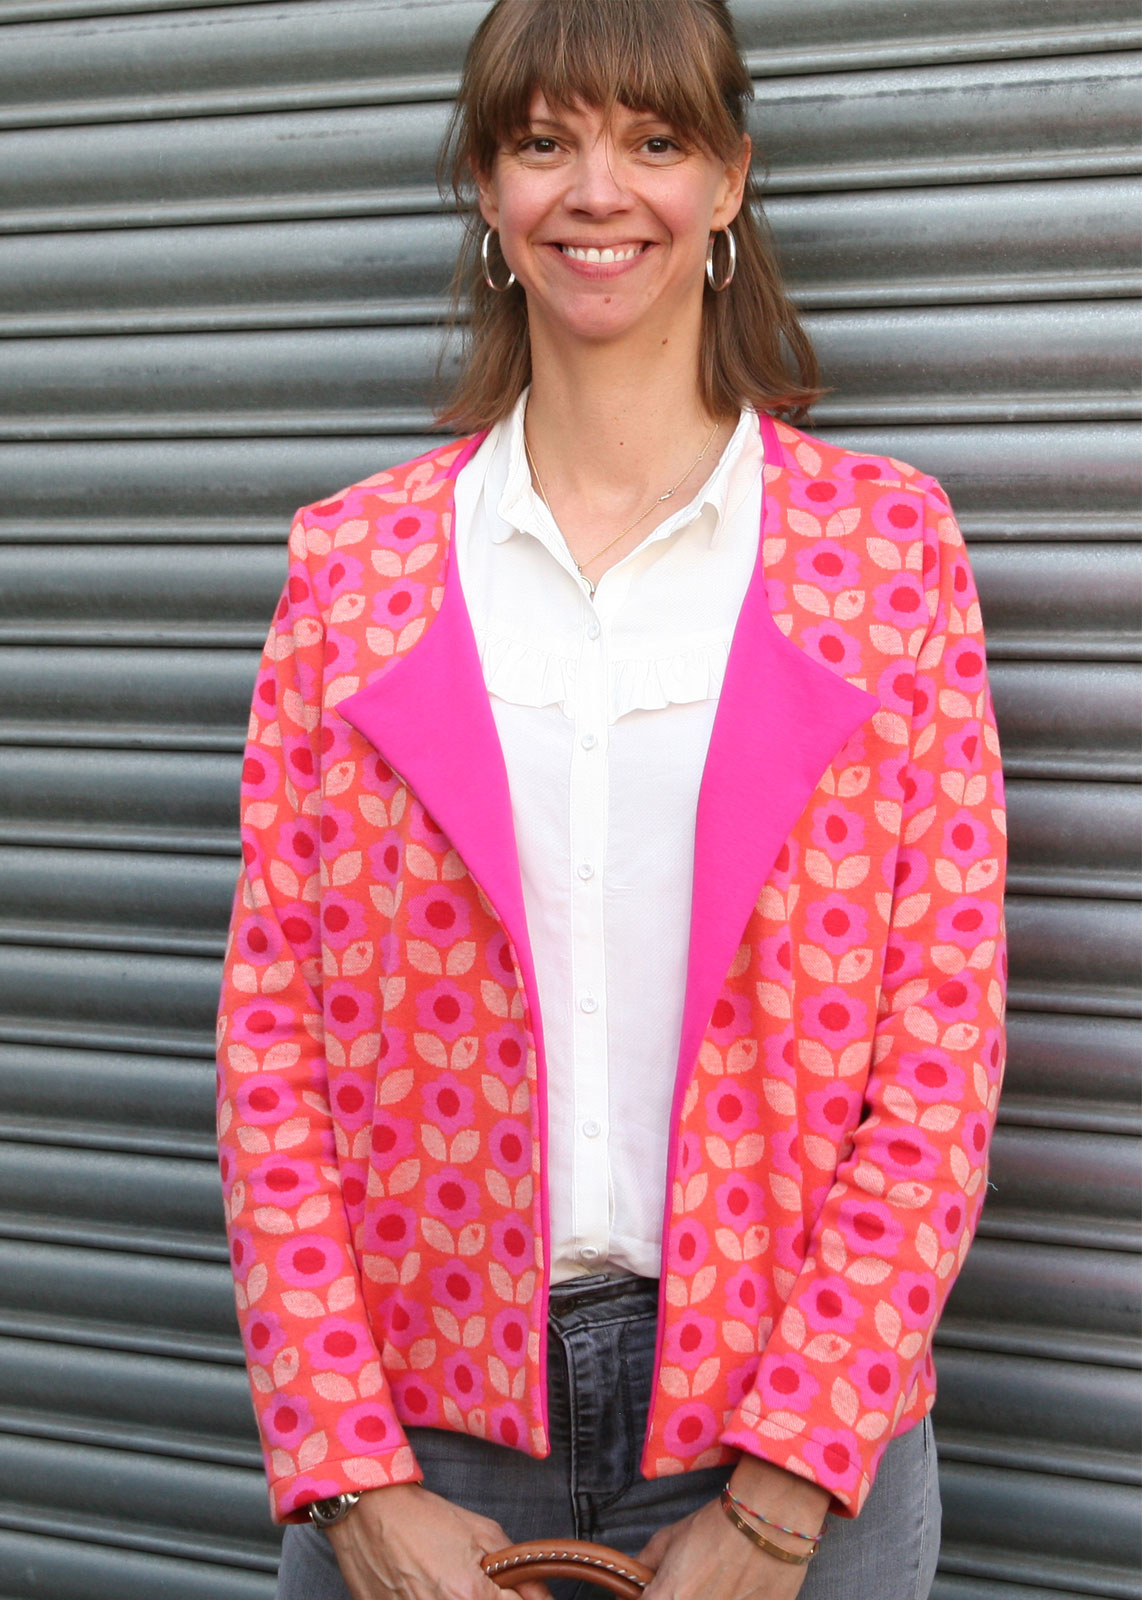 byGraziela_Sommer_Outfits_Jacquard_Jacke_Frau_Tomma_Sommersweat_Pink